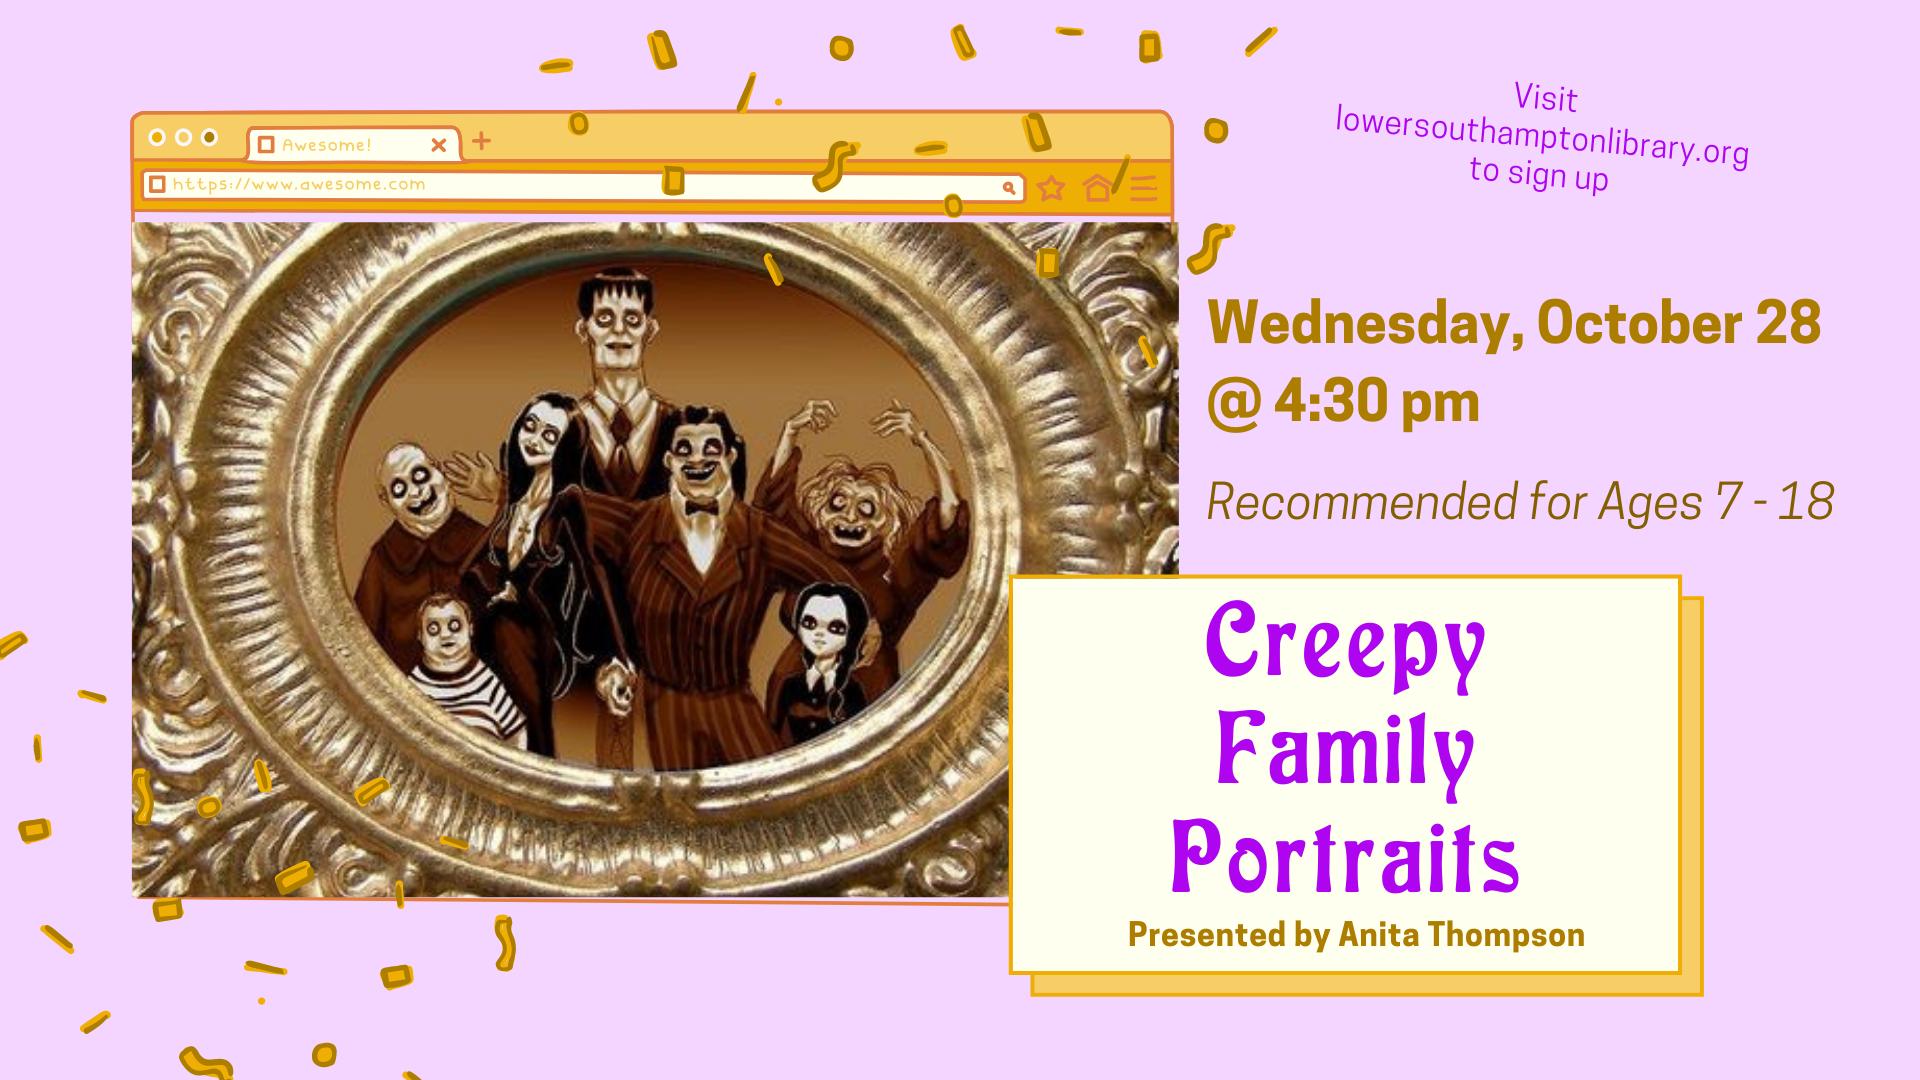 Creepy Family Portraits | Ages 7 - 18